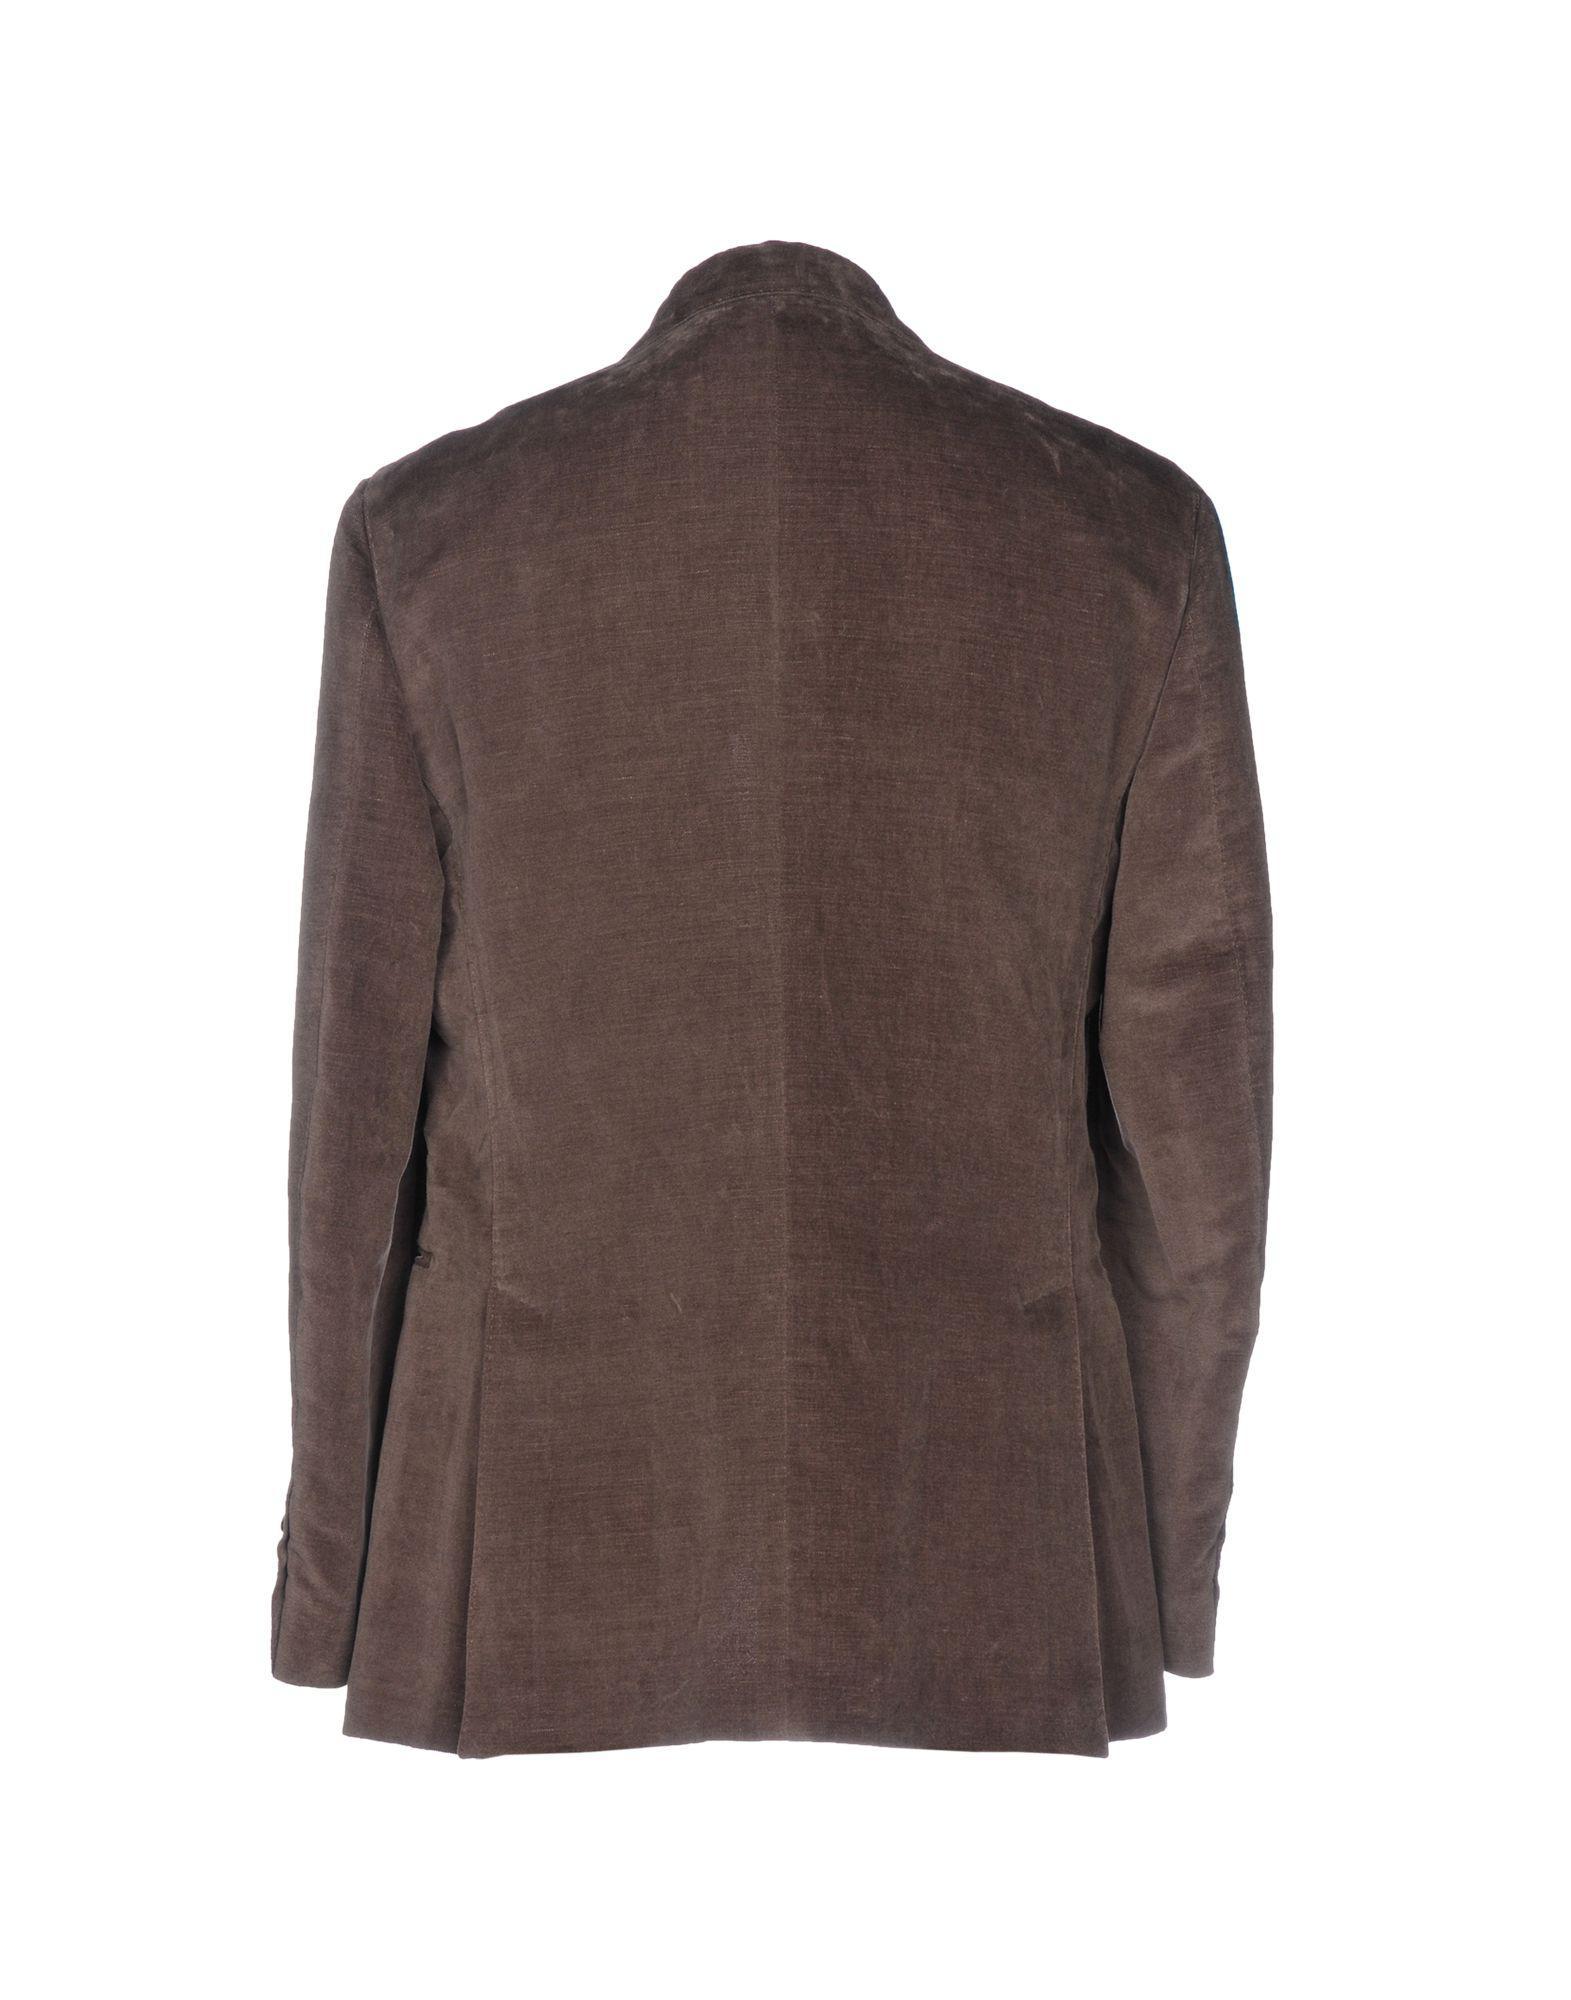 Lardini Velvet Blazer in Dark Brown (Brown) for Men